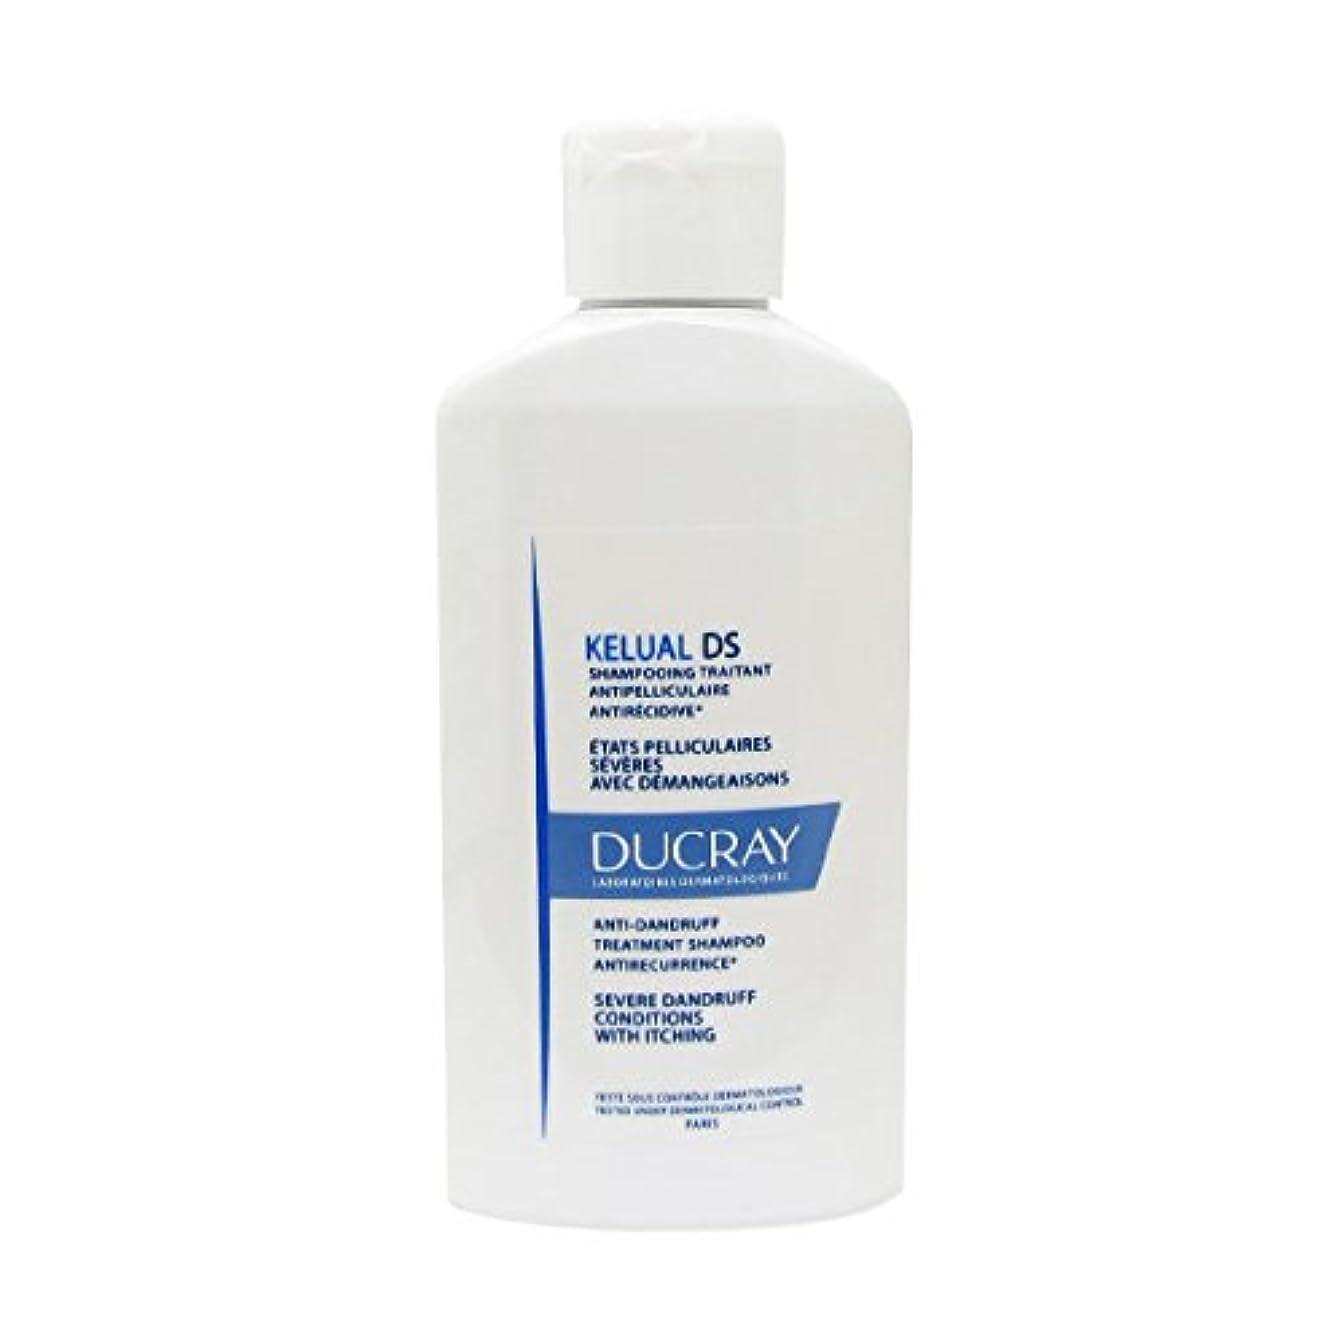 心理学難破船経営者Ducray Kelual Ds Squamo-reducing Shampoo 100ml [並行輸入品]